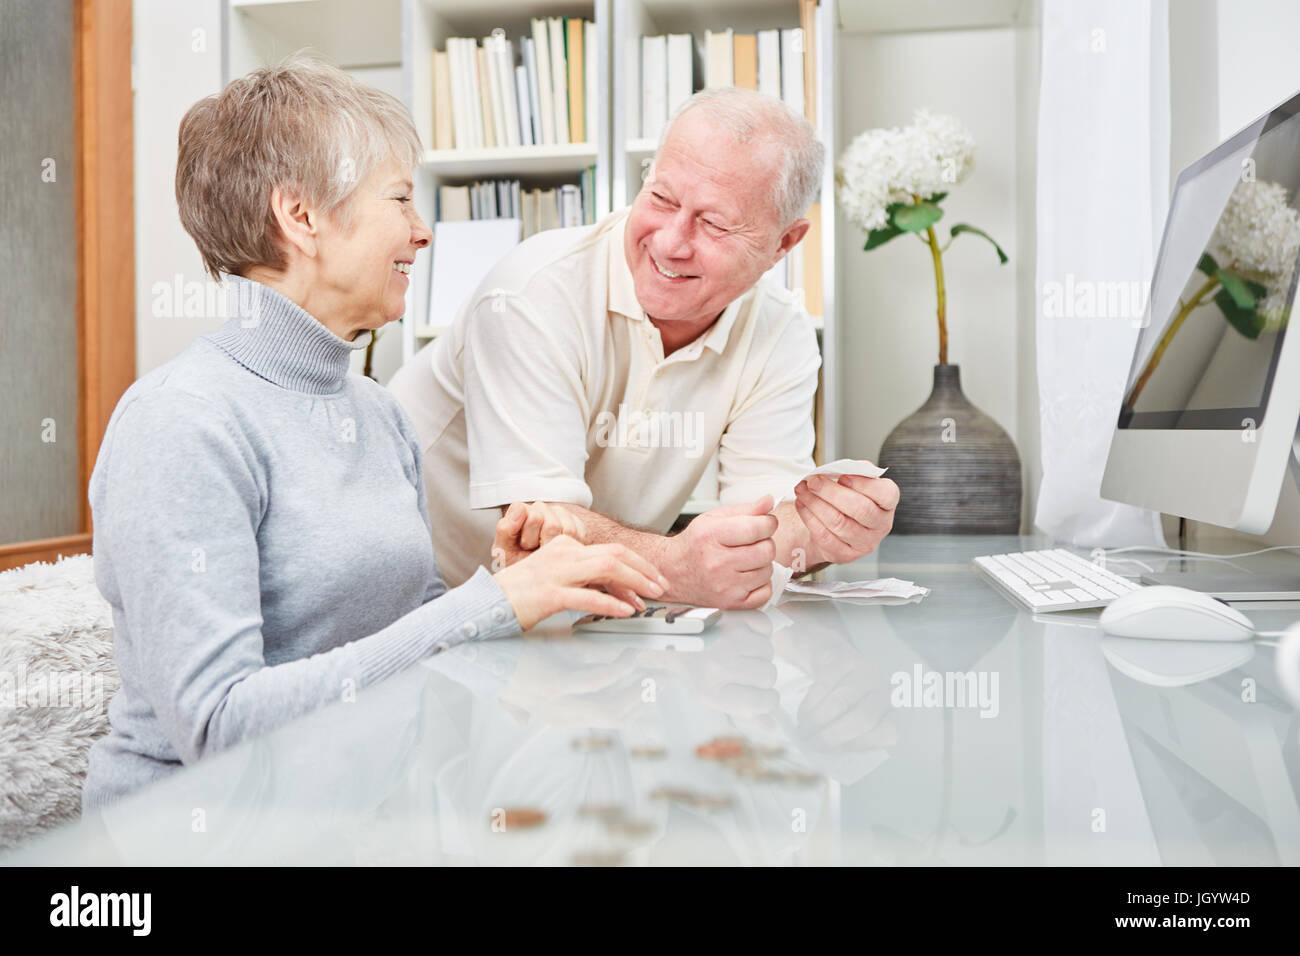 retirees stockfotos retirees bilder alamy. Black Bedroom Furniture Sets. Home Design Ideas